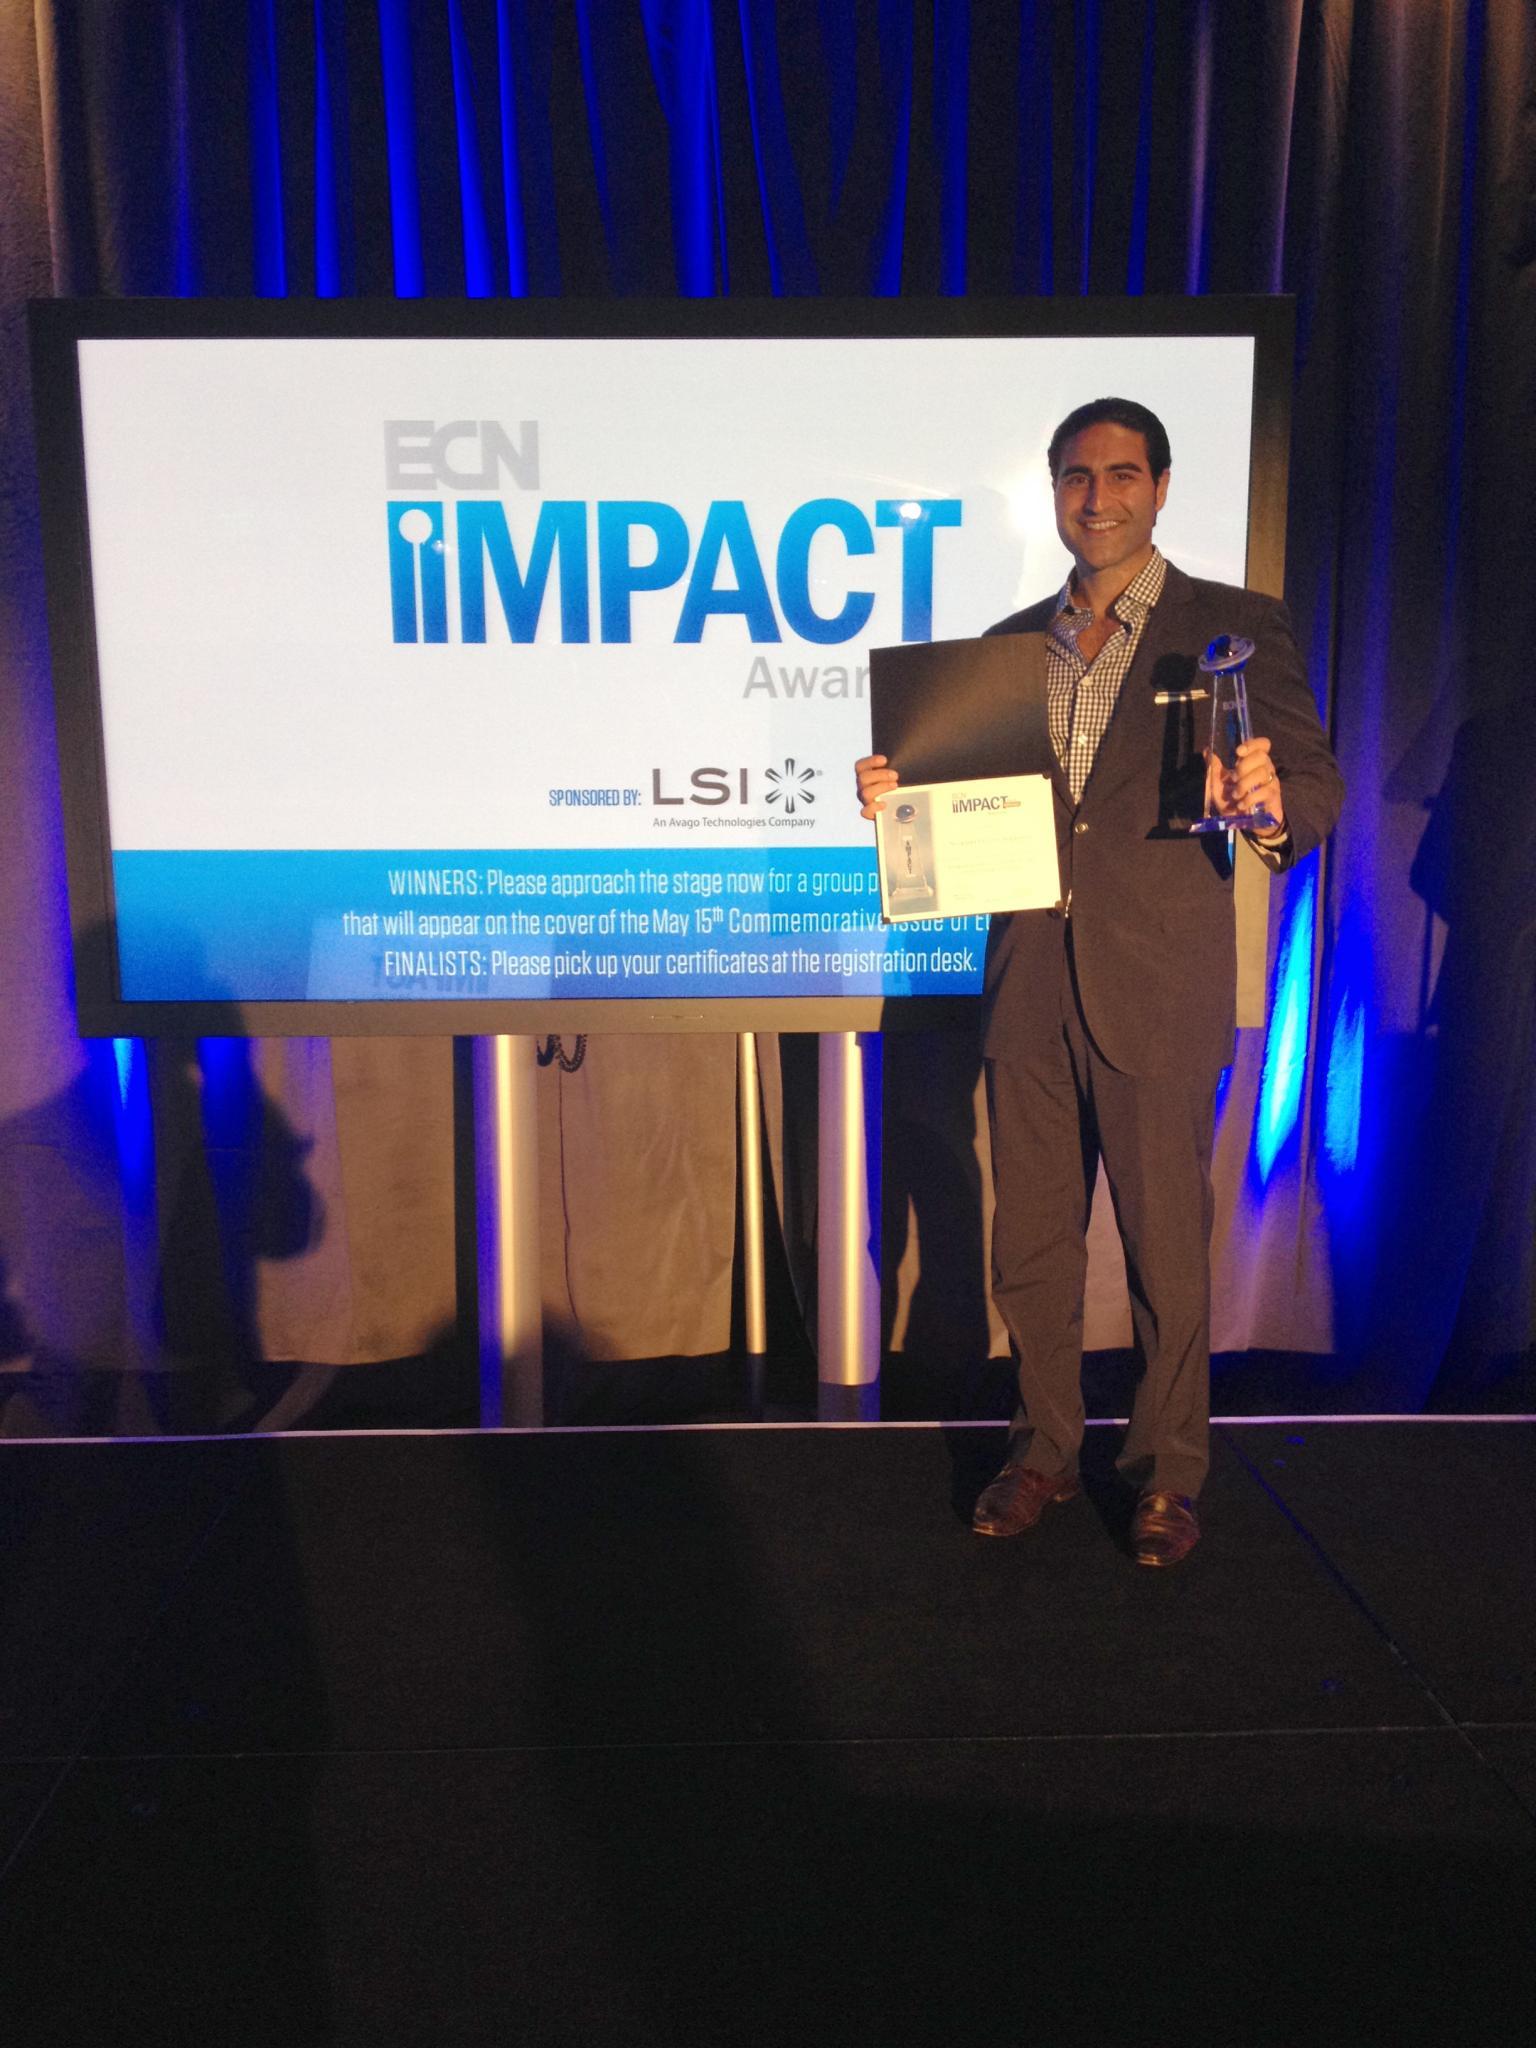 Alex Karapetian, Director of Sales and Marketing at Acopian Power Supplies, accepts the 2014 ECN Impact Award